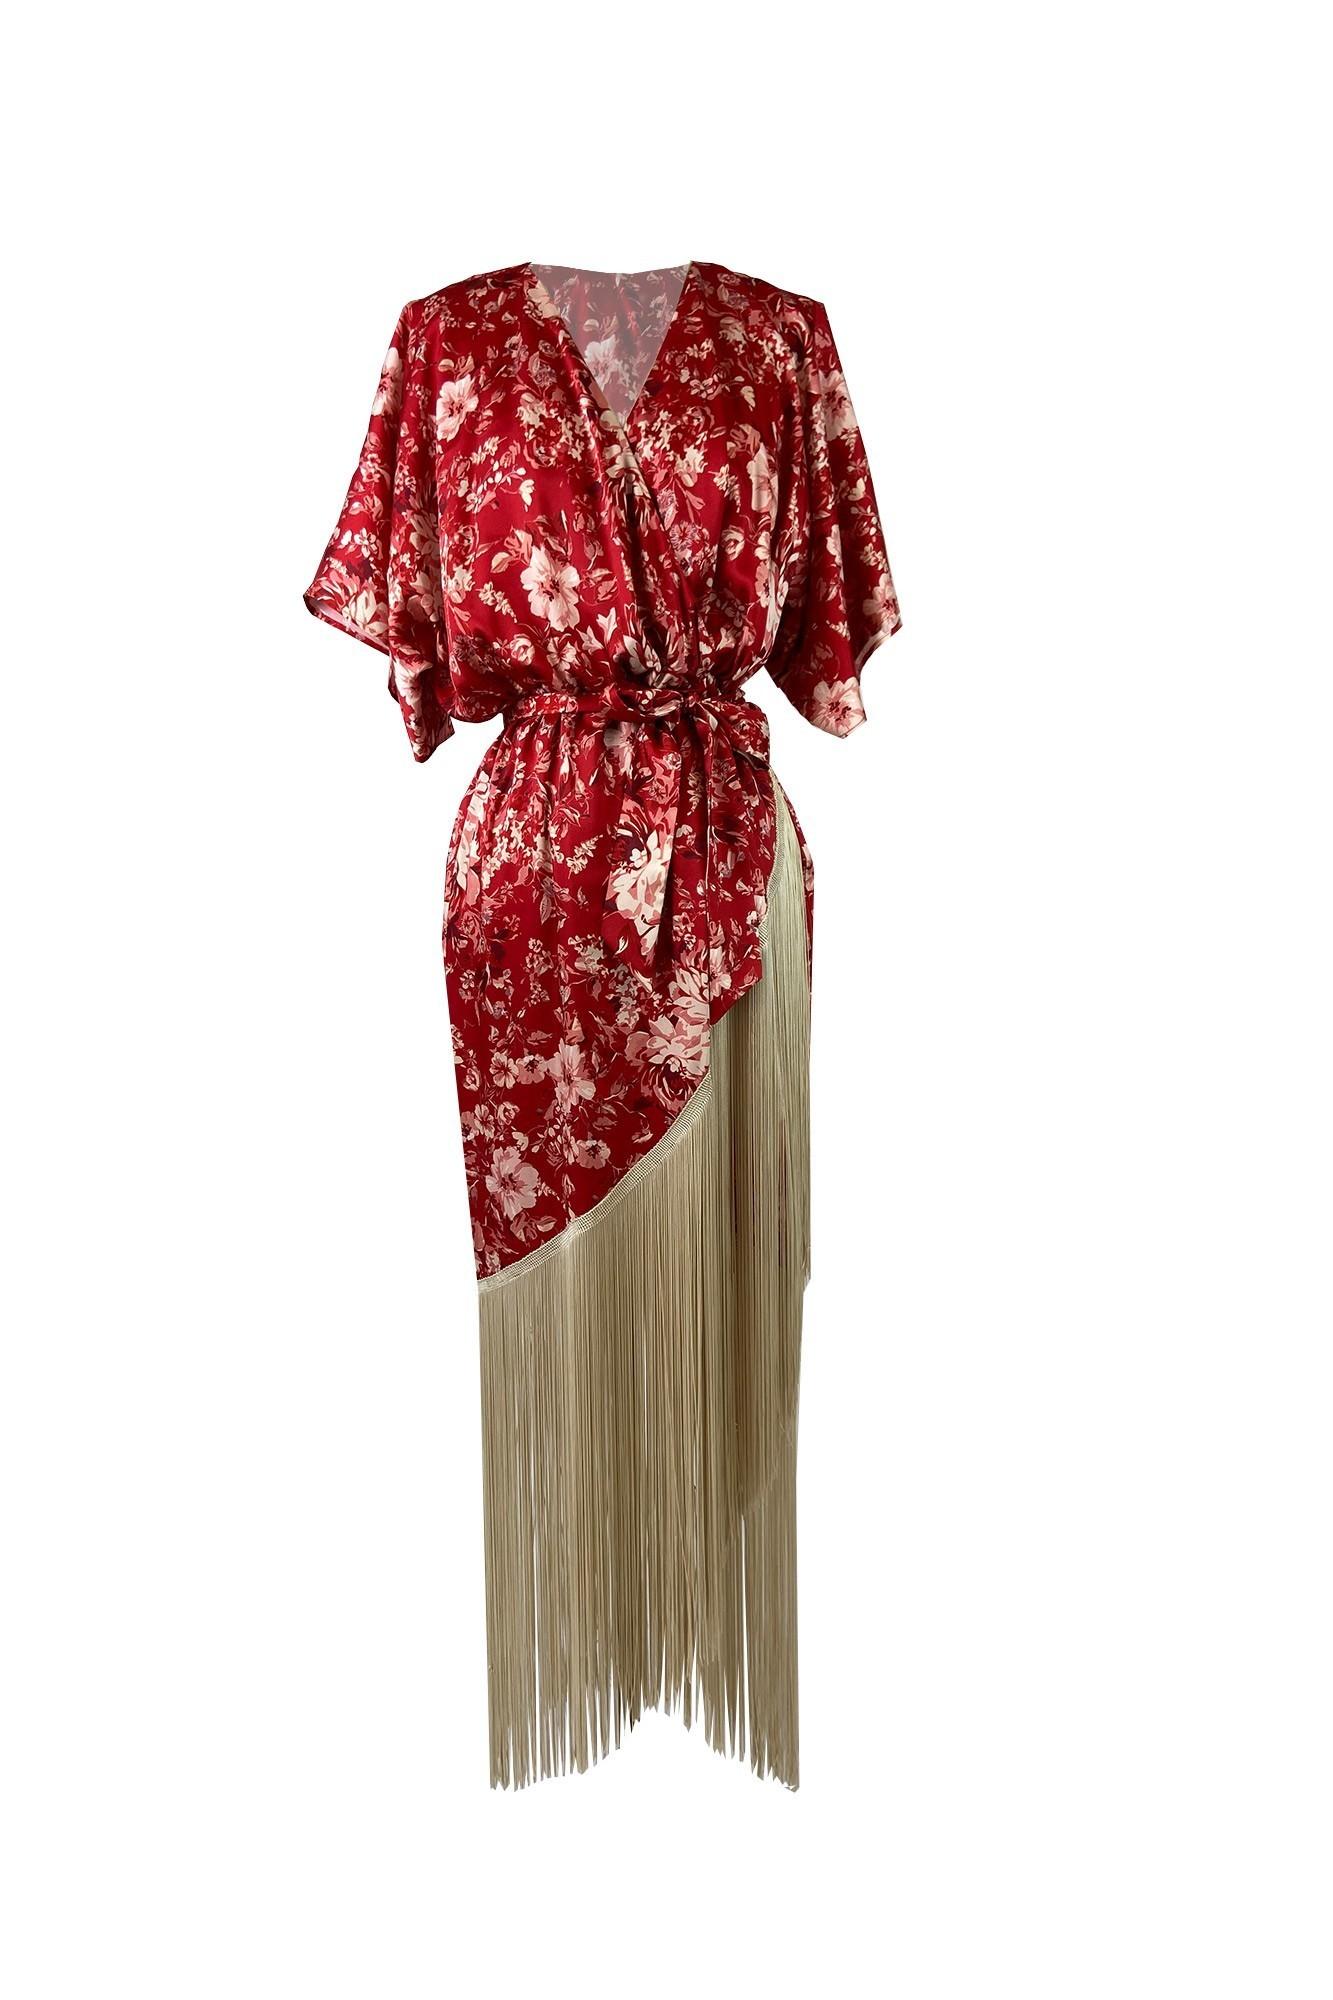 ONDINA RED DRESS